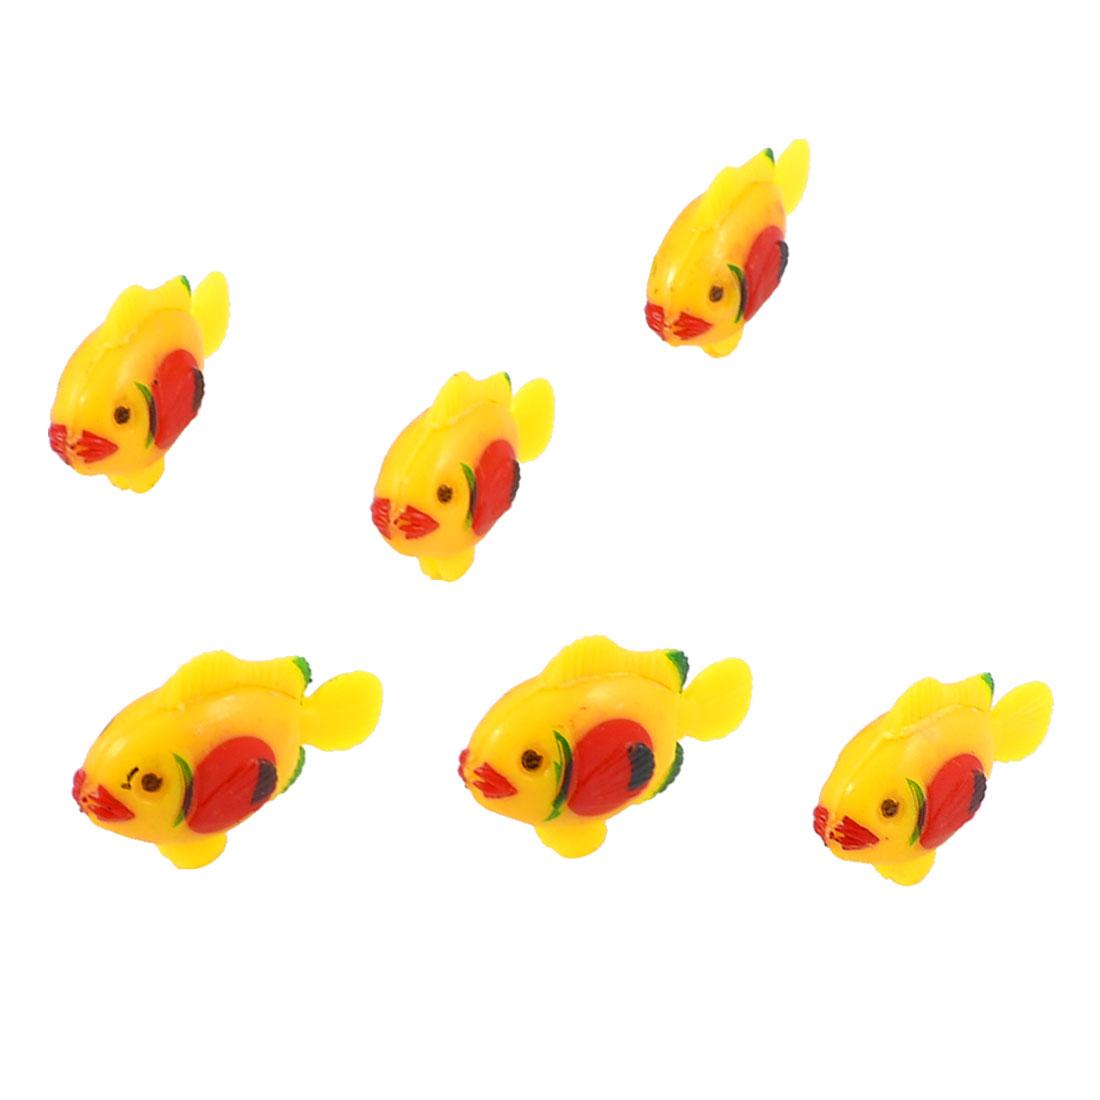 Wiggling Tail Three Colors Plastic Fishes Aquarium Fish Tank Decor 6 Pcs